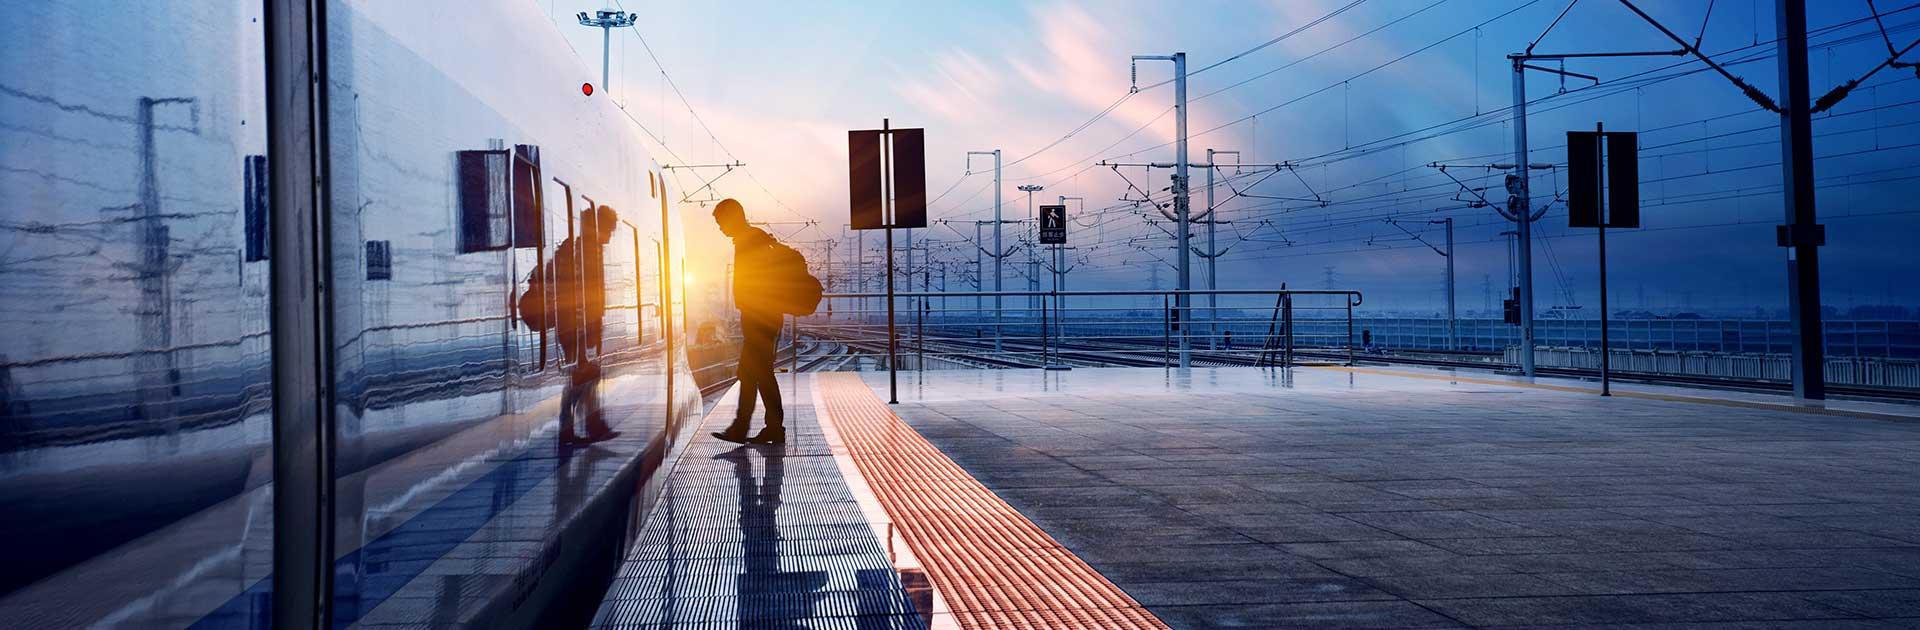 Vorbereitungskurs-auf-Umschulungen-im-Eisenbahnverkehr–Intensivlehrgang